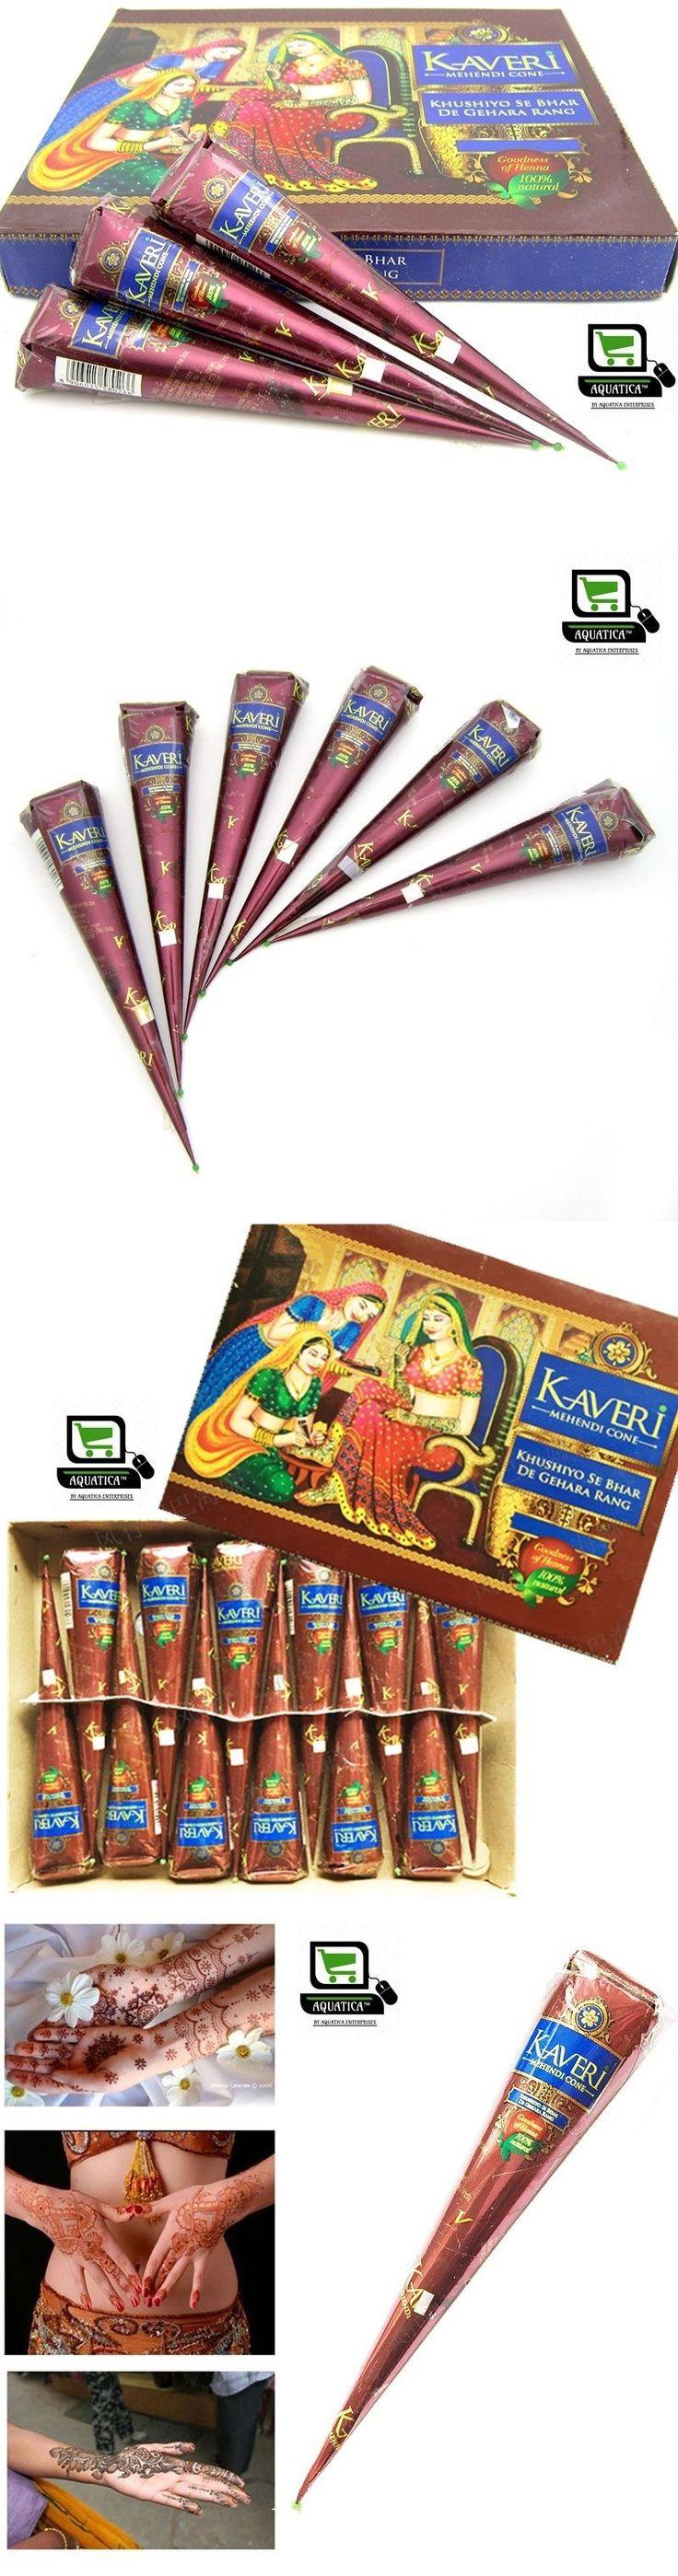 Henna Paste and Powder: 12 X Fresh Quality Kaveri Natural Henna Mehndi Tattoo Pen Cone Darkest Brown BUY IT NOW ONLY: $37.95